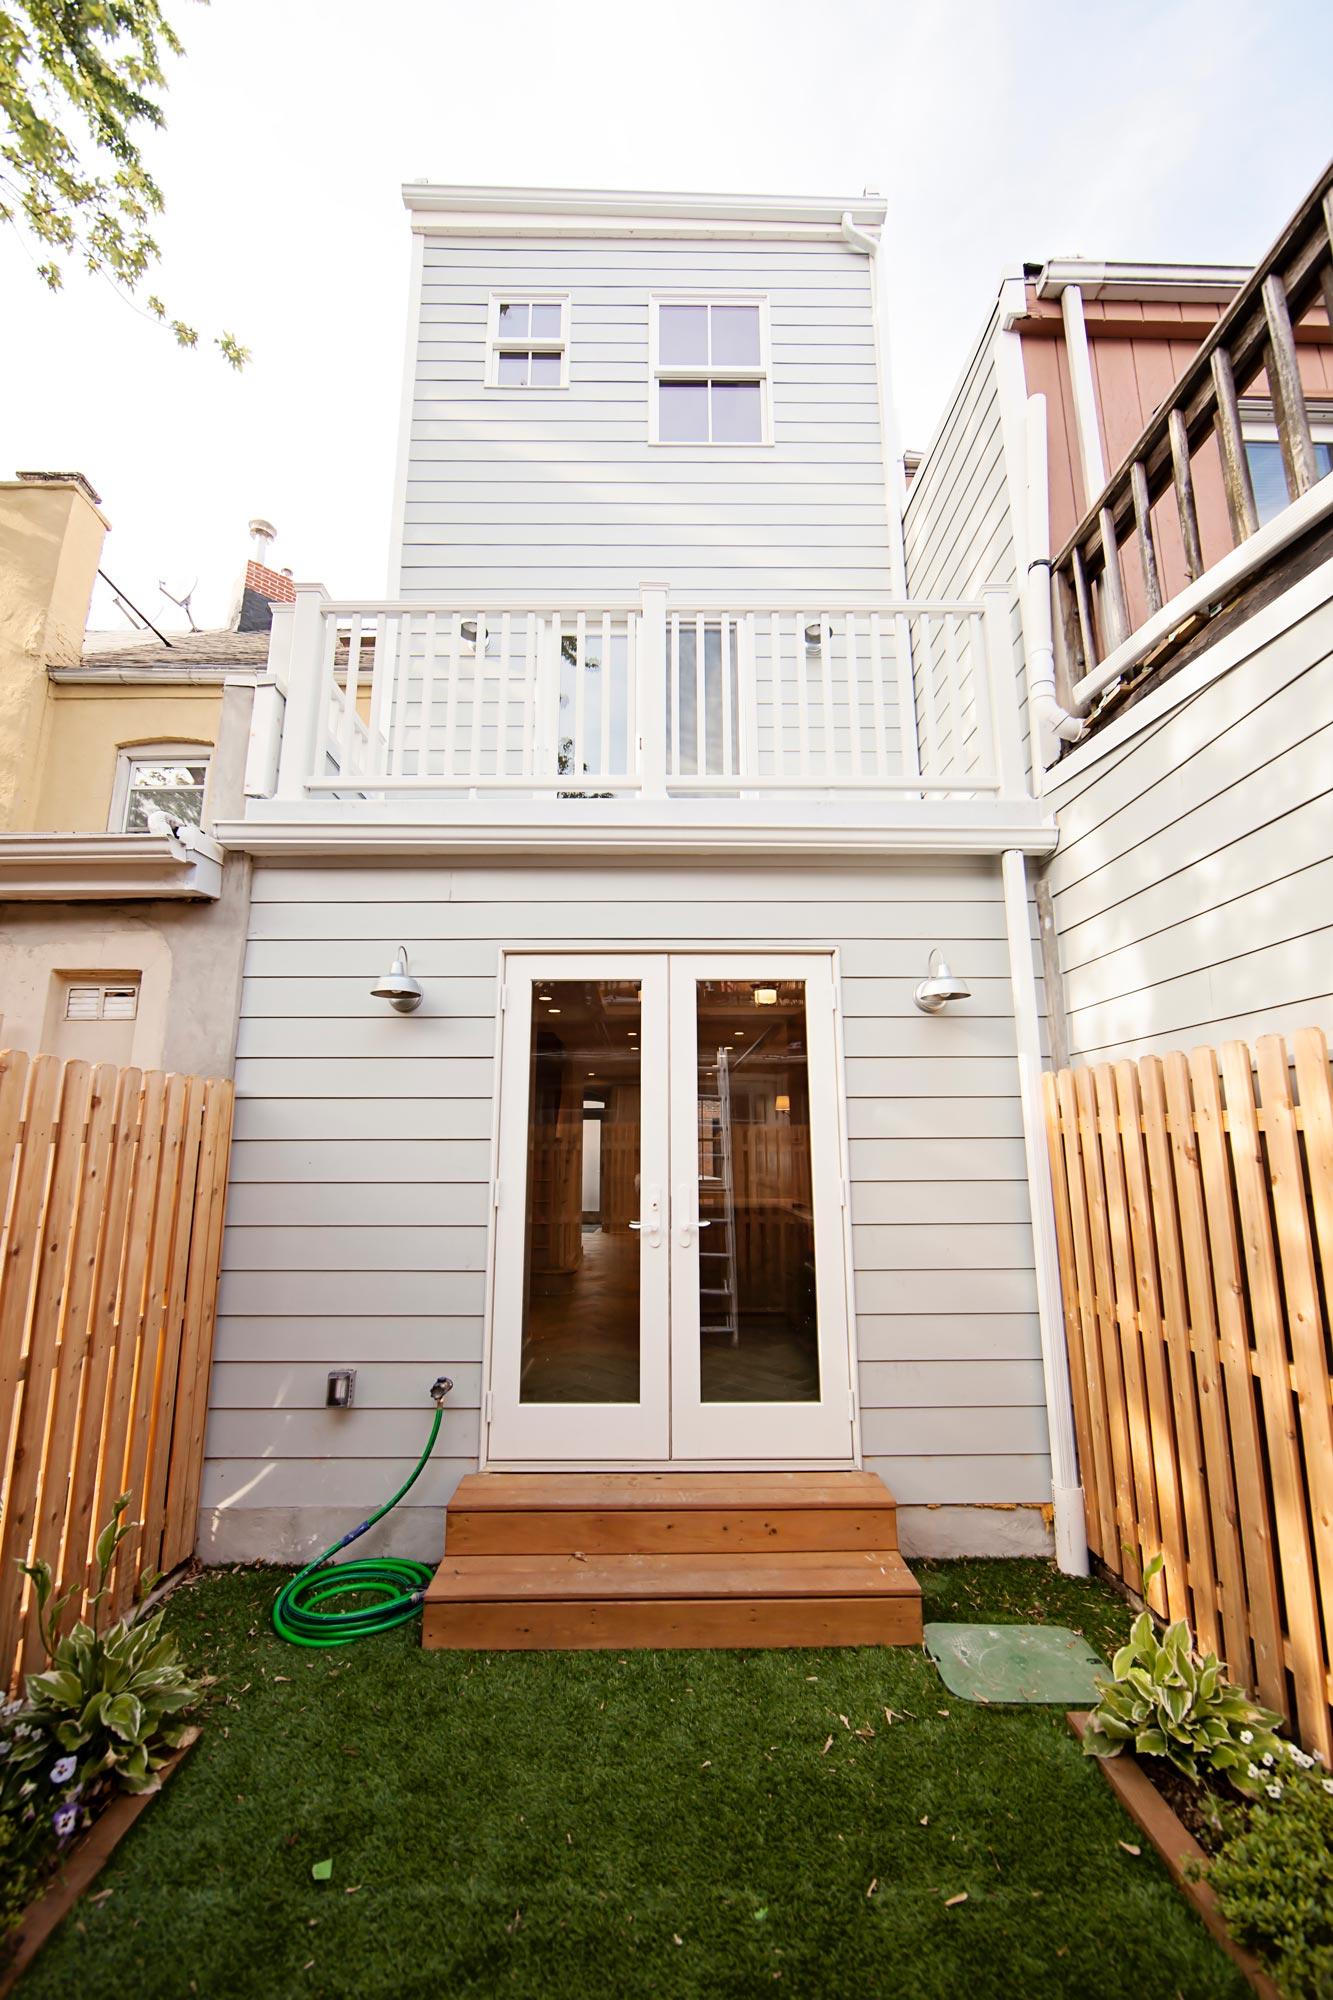 thompson-fine-home-renovations-hoboken-new-jersey-construction-14.jpg